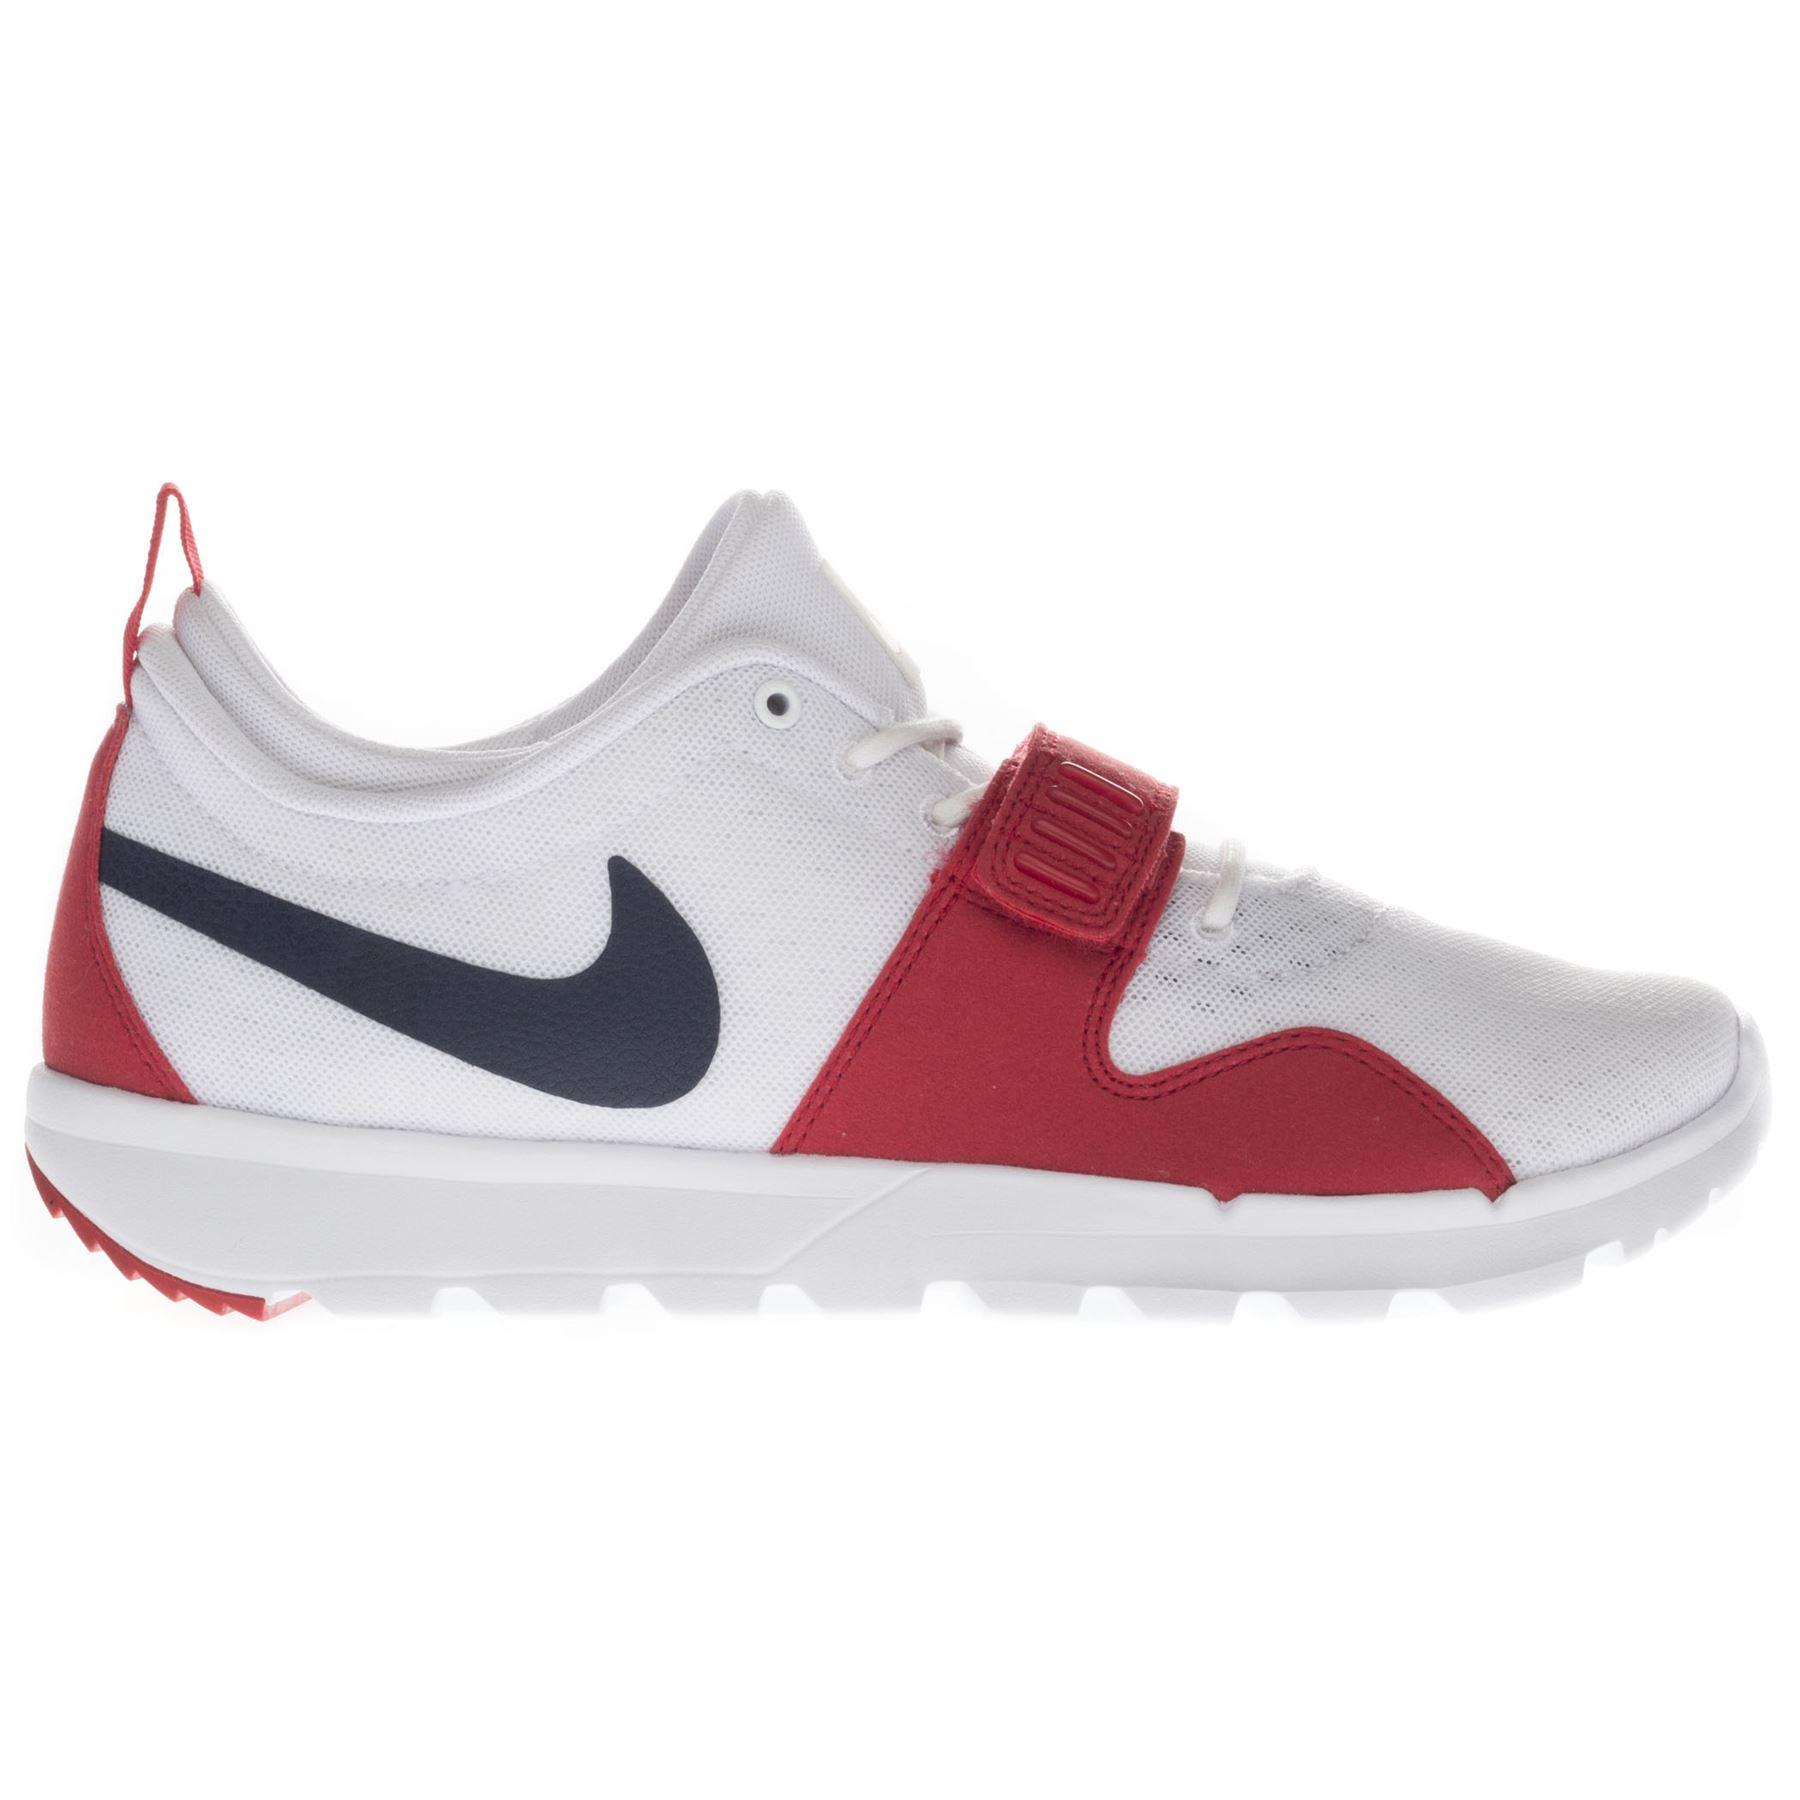 Nike SB Trainerendor L Sneaker Uomo Scarpe da ginnastica 806309 002 UK 5.5 EU 38.5 US 6 NUOVE